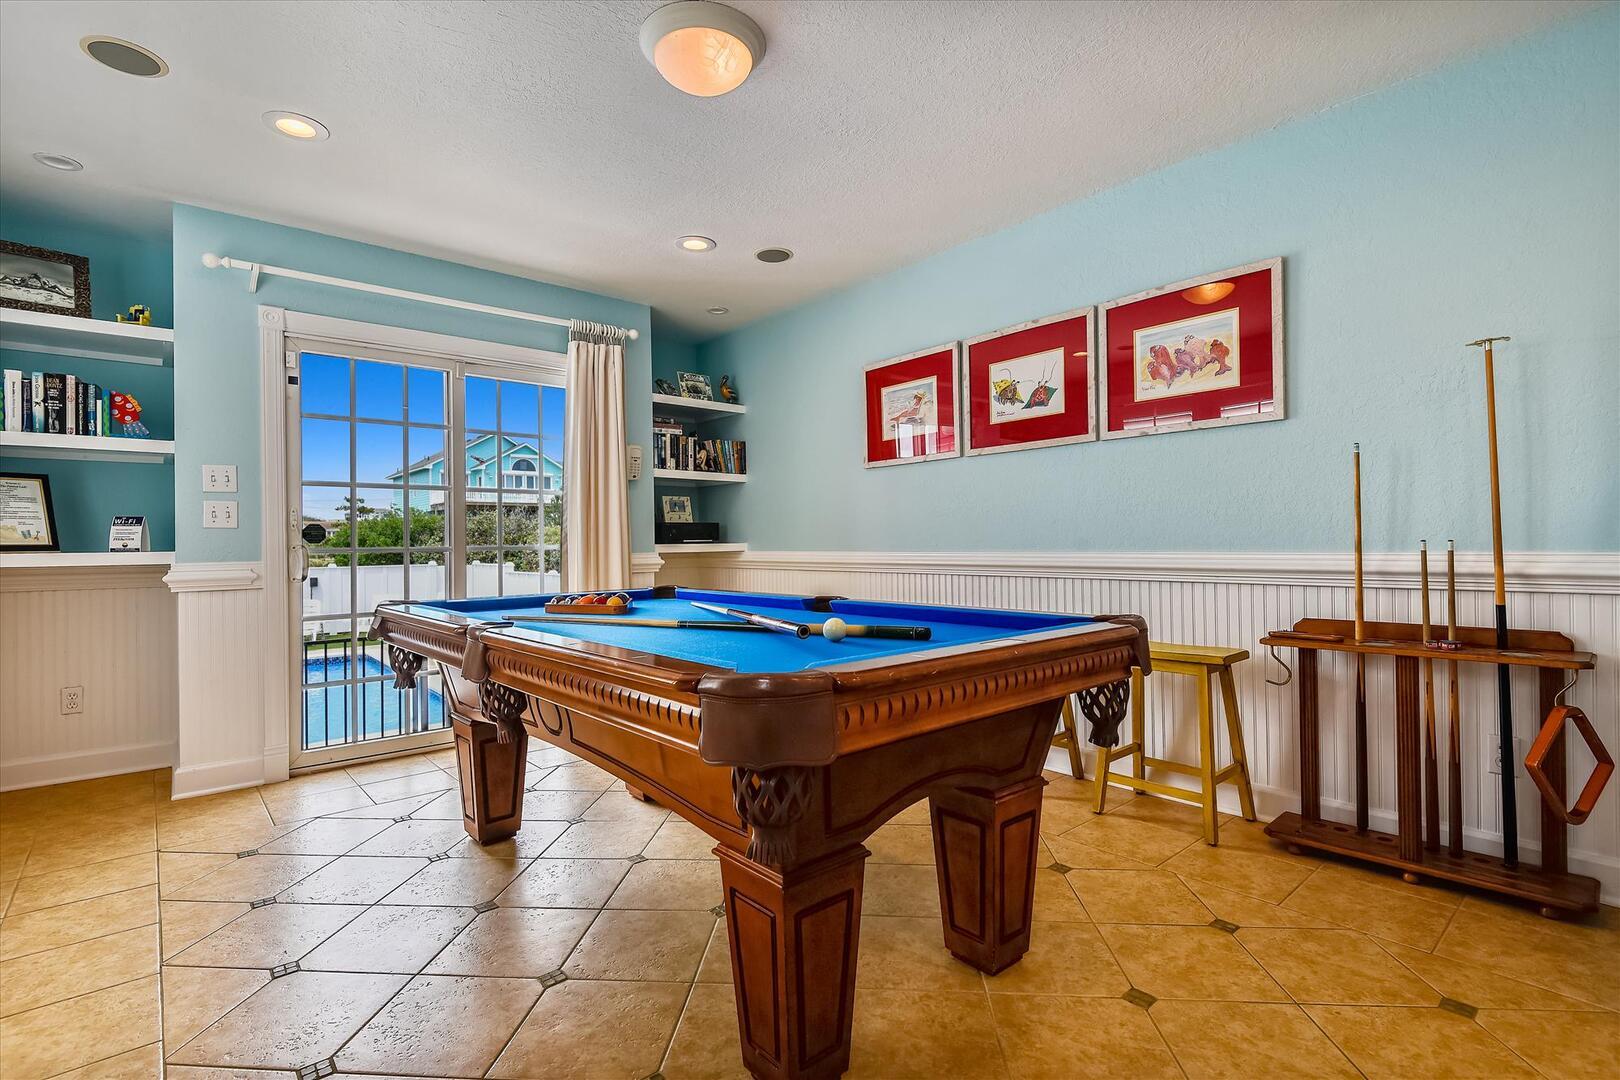 Pool Level,Recreation Room,